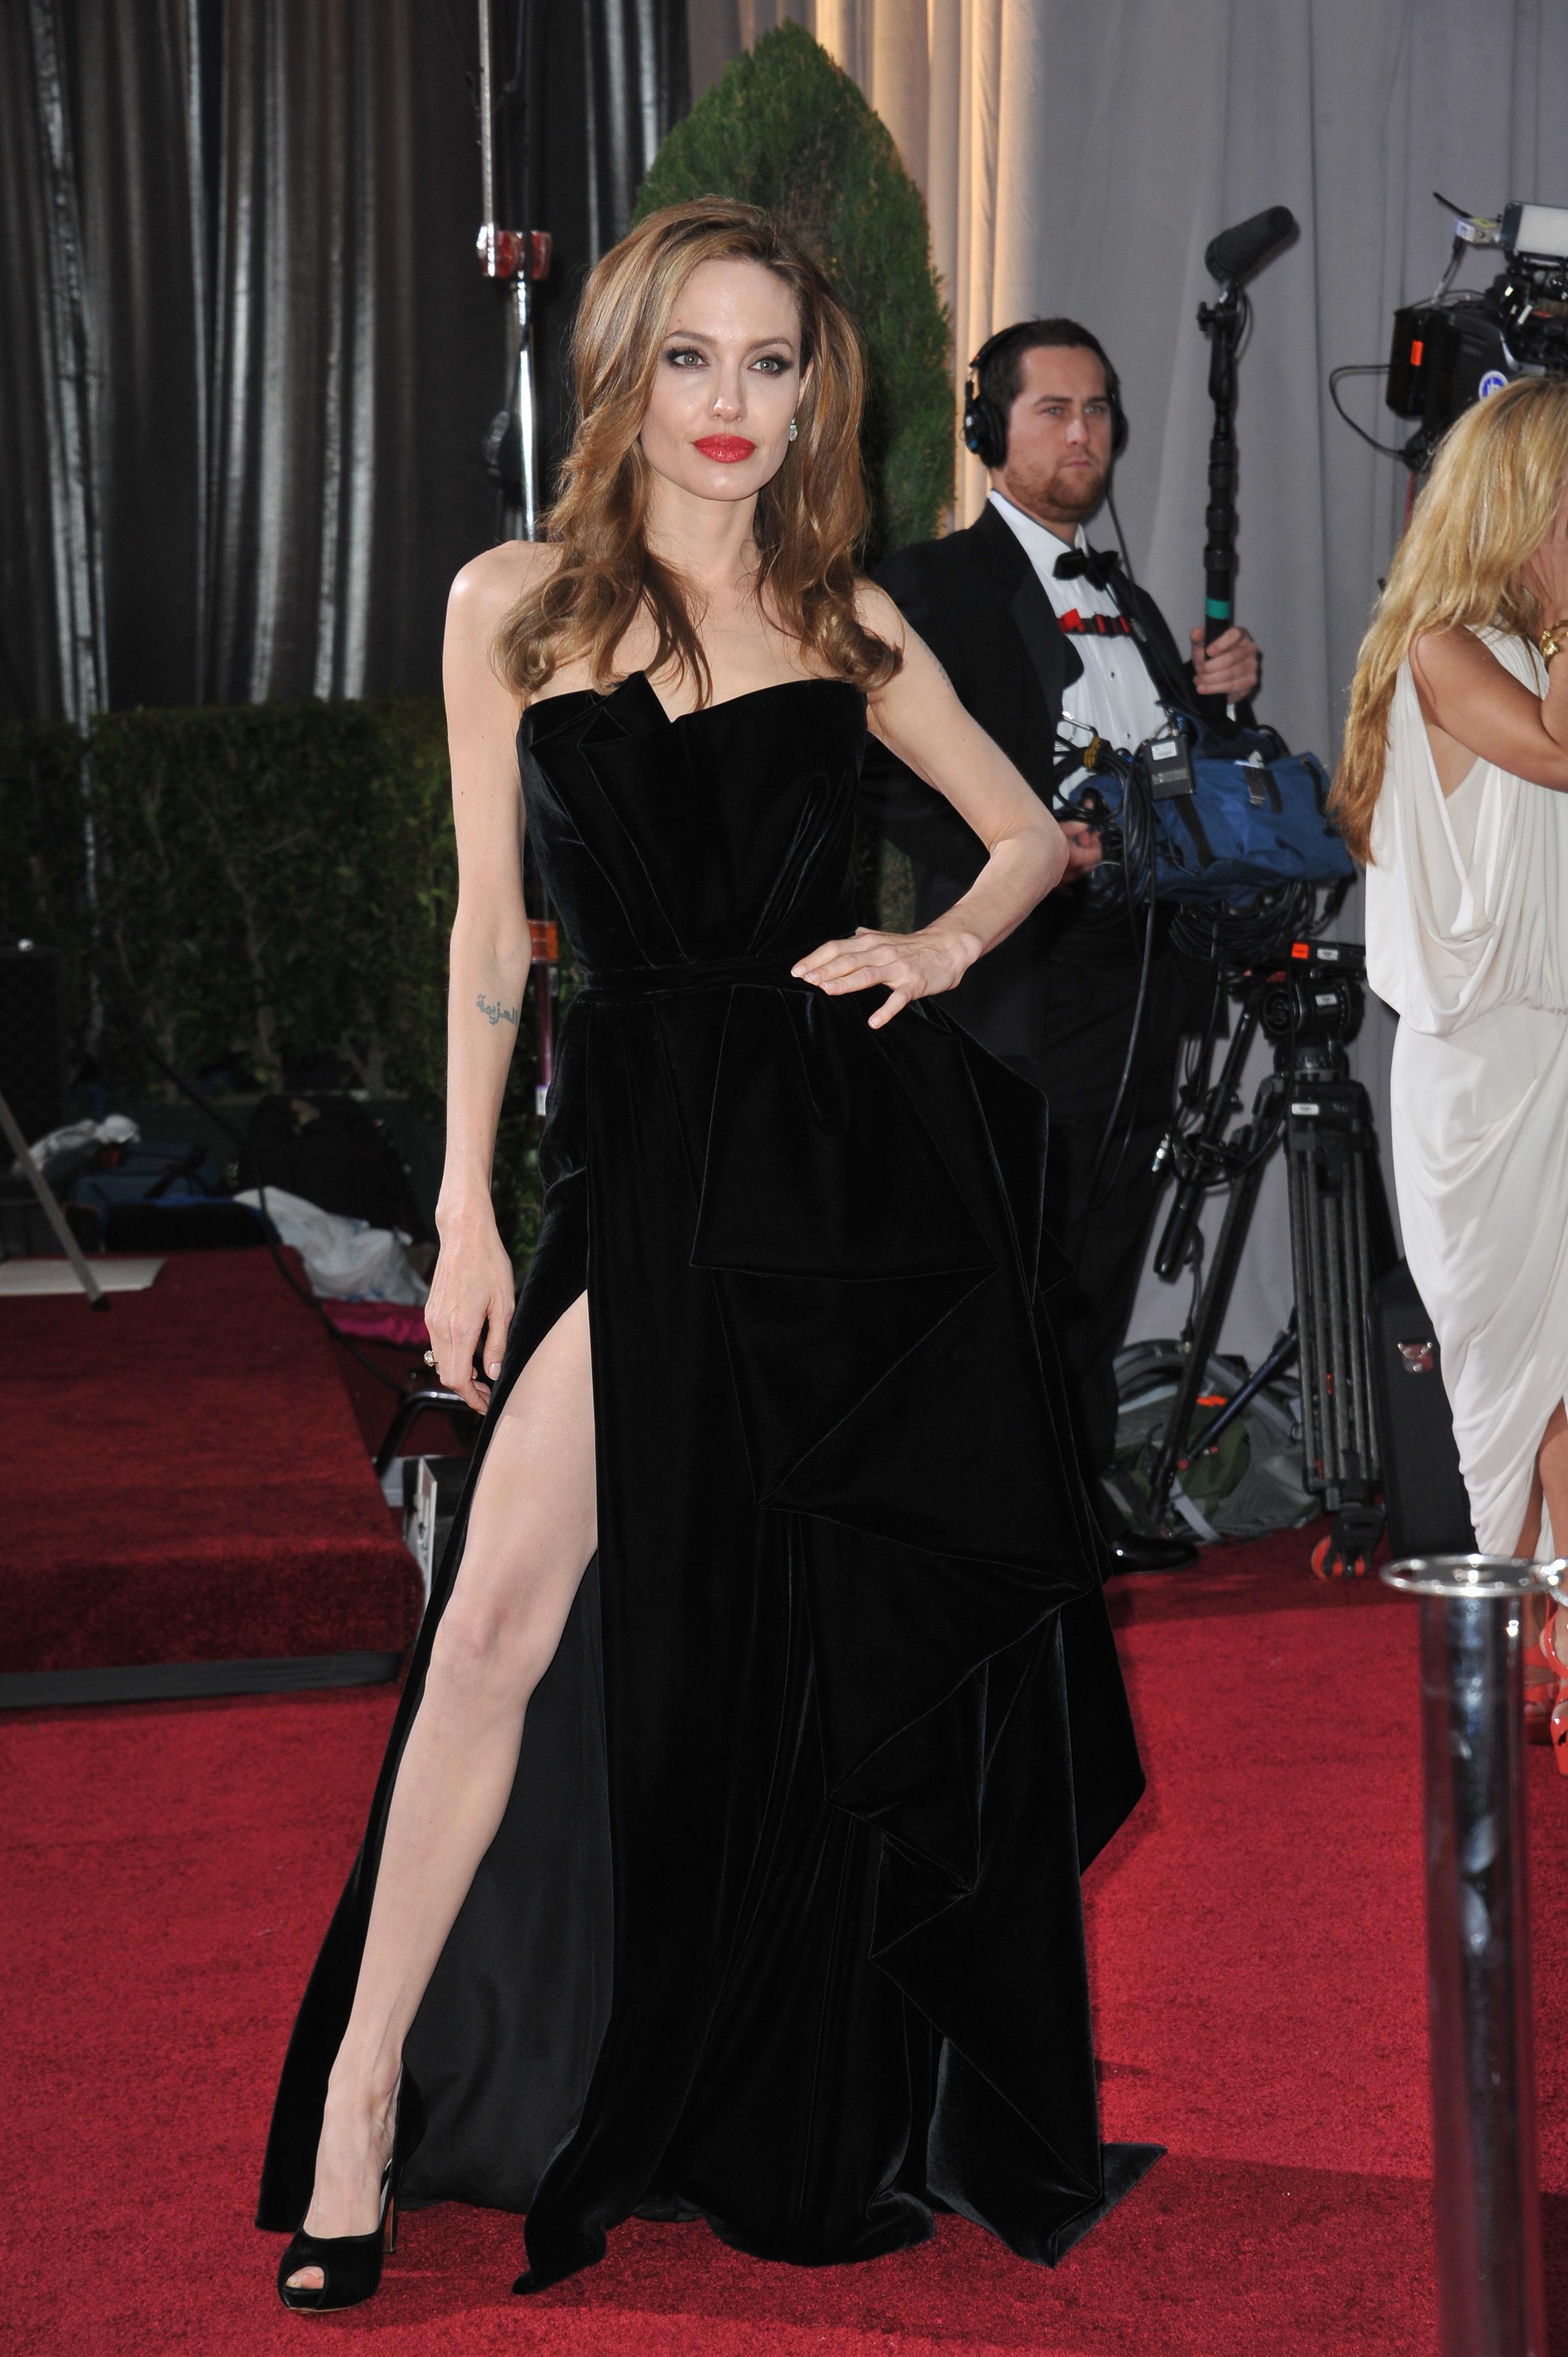 Angelina Jolie: i 5 look più belli dell'attrice